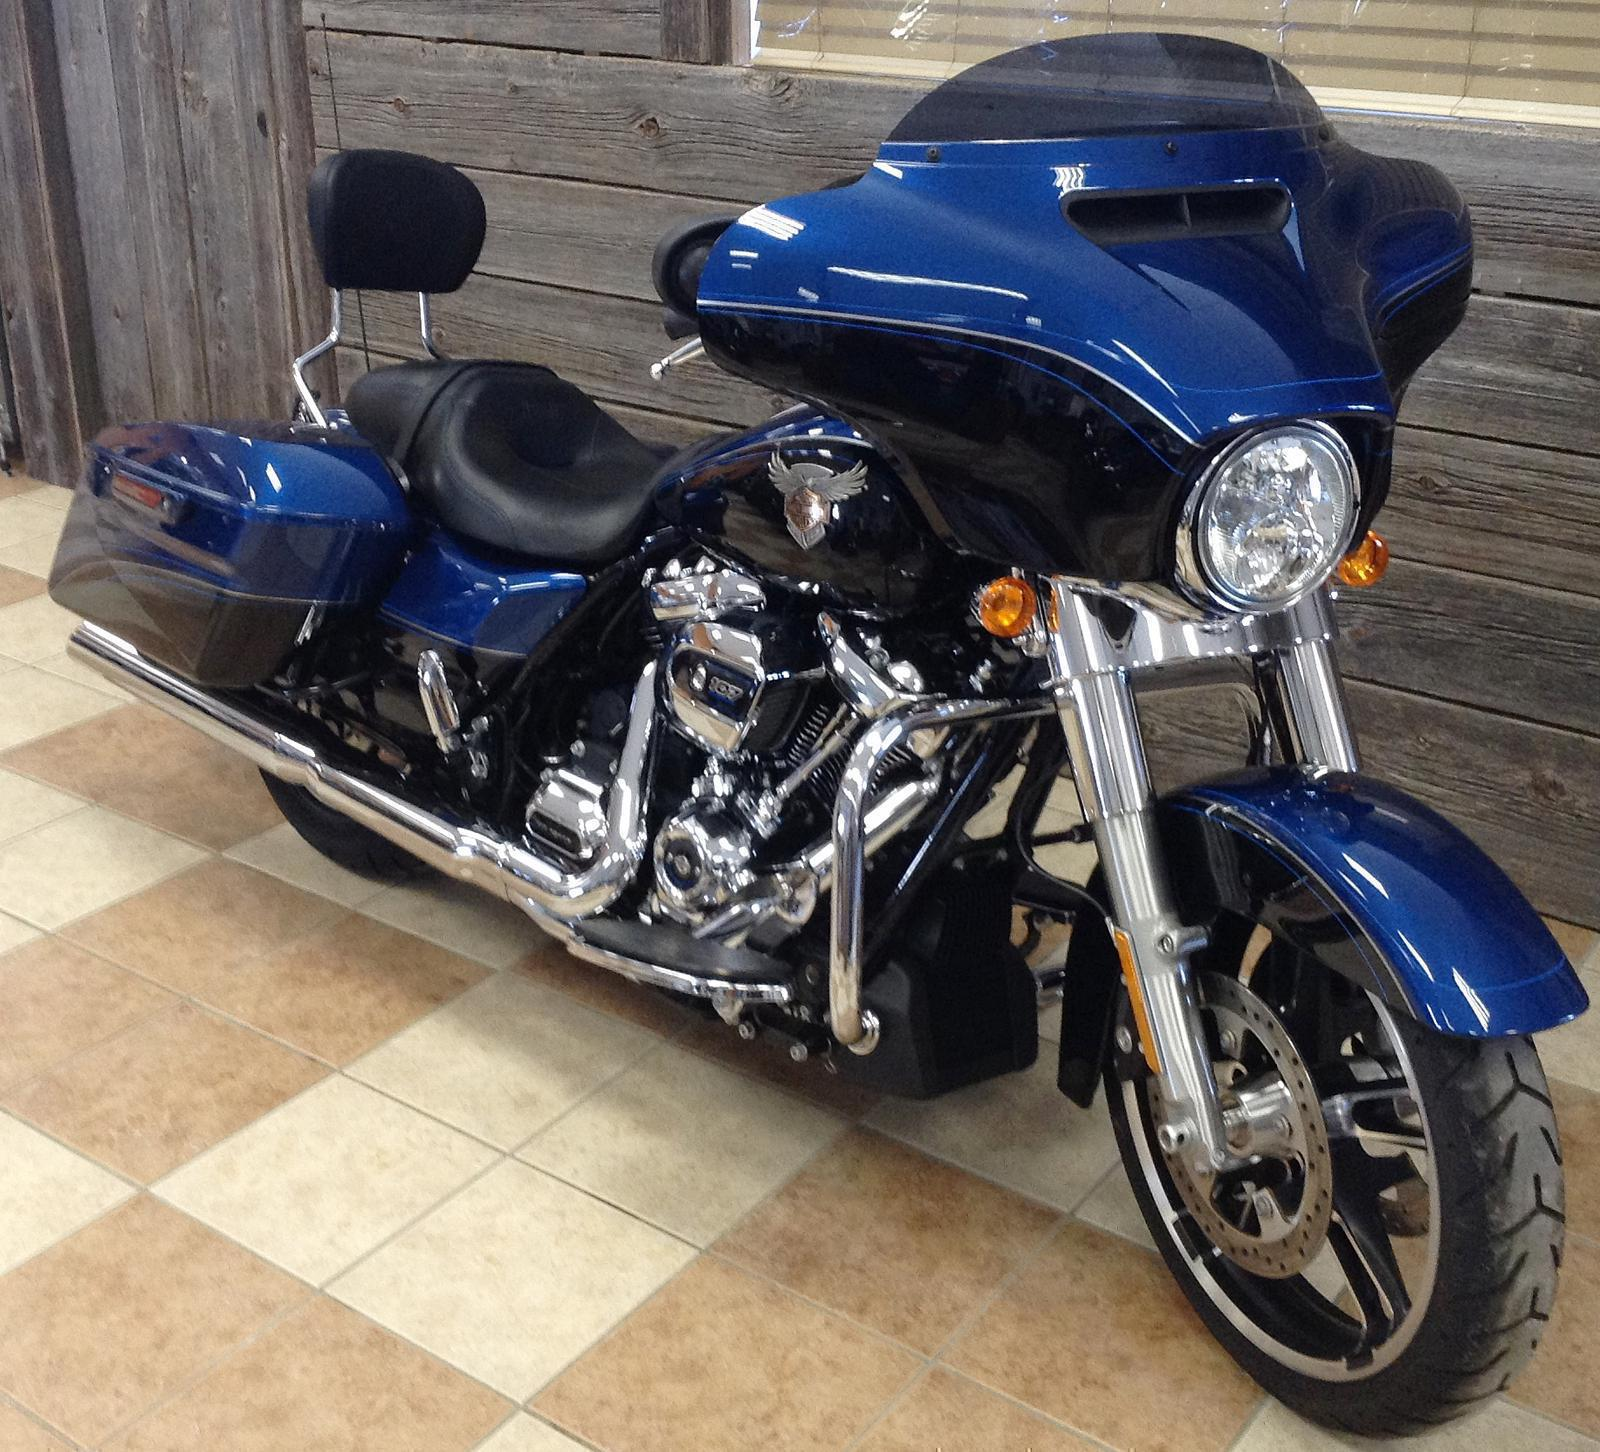 2018 Harley-Davidson® Street Glide® - Anniversary Color Option